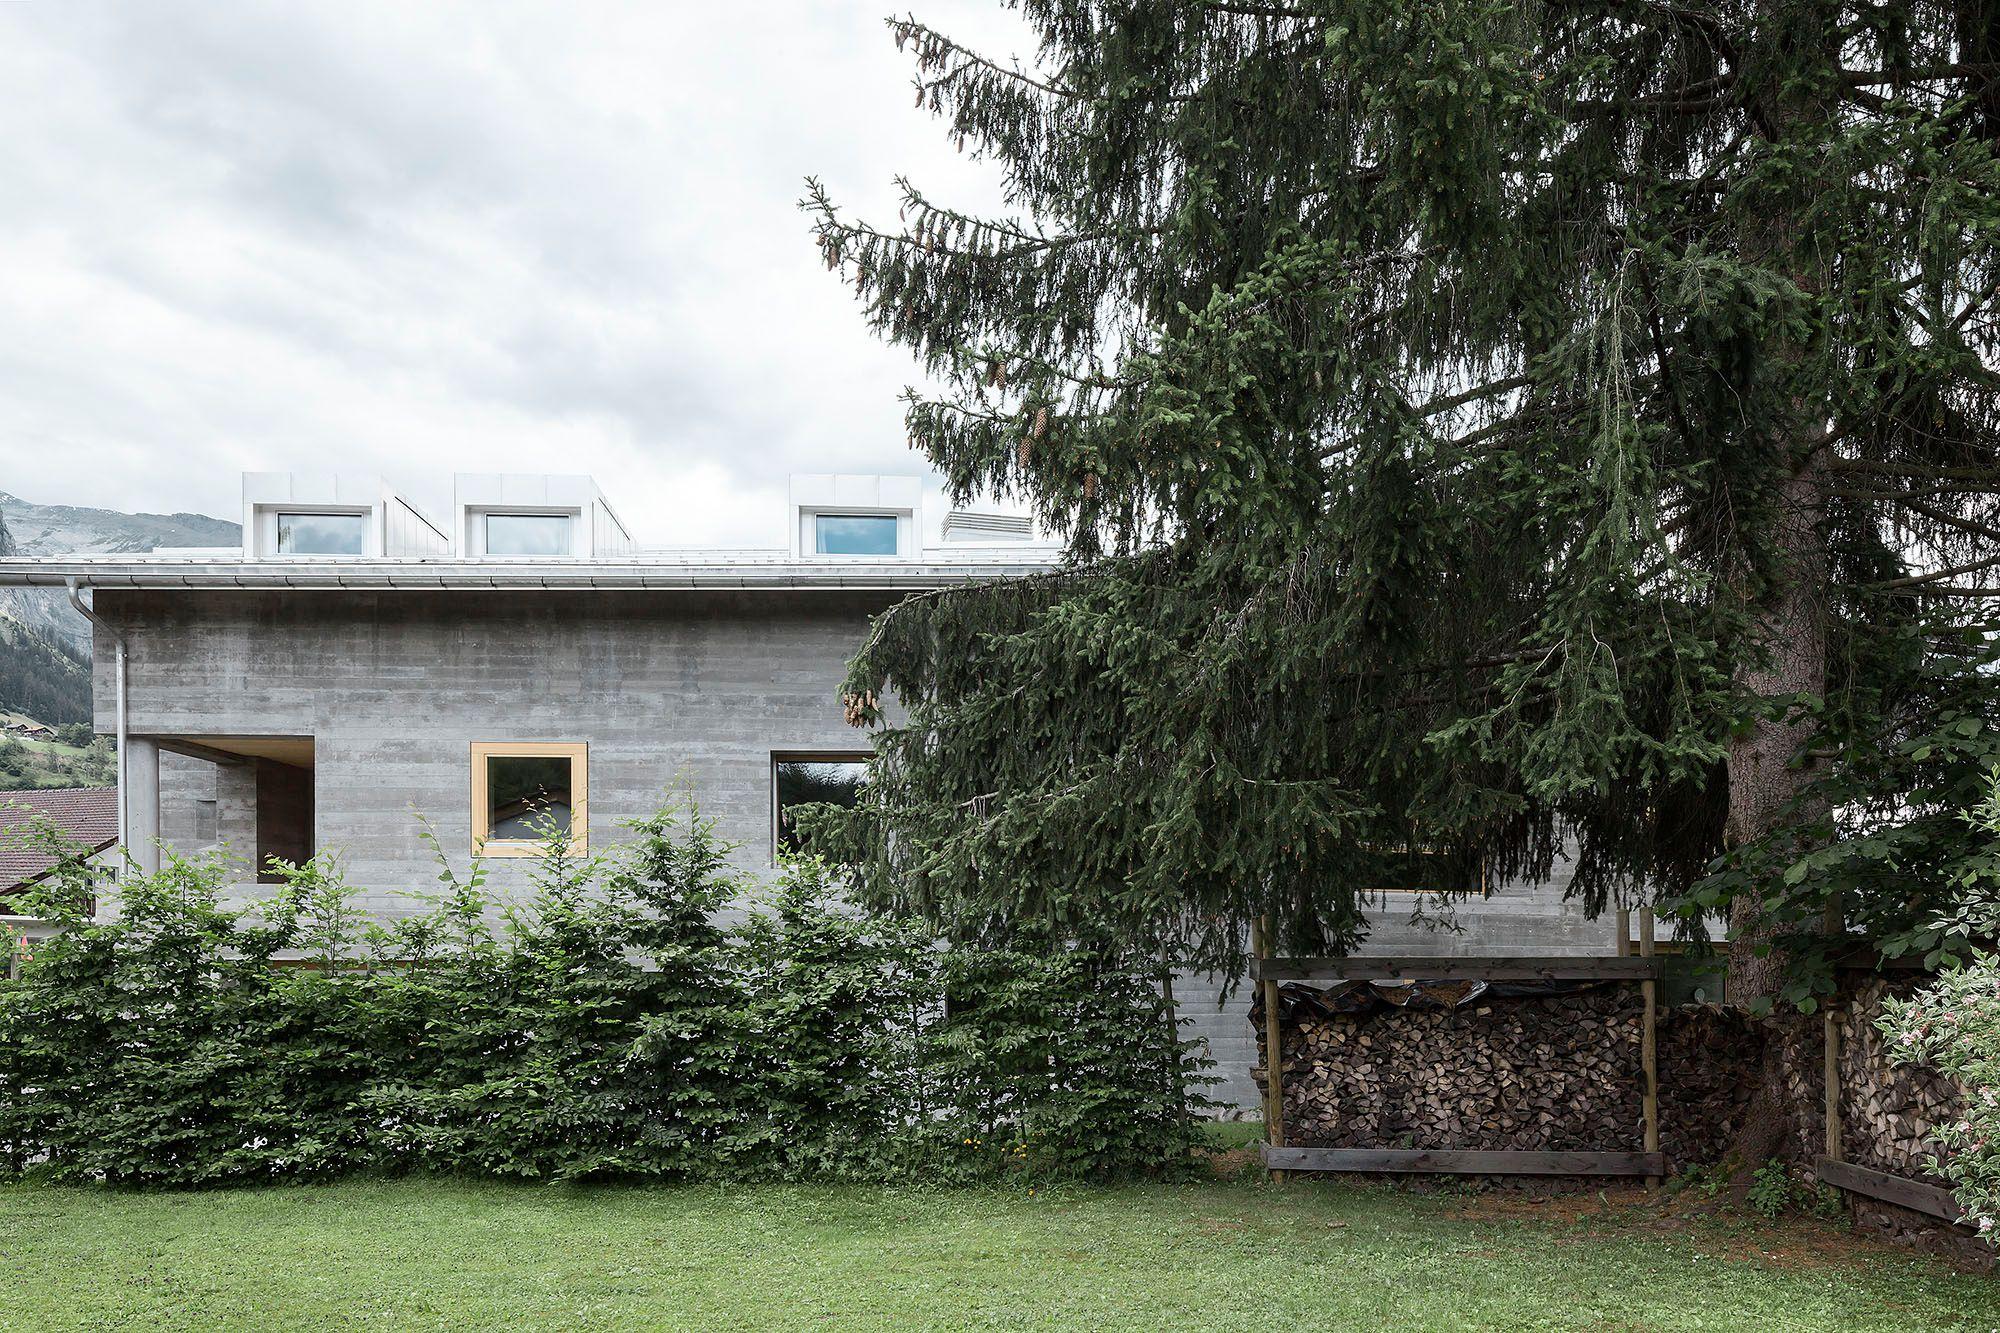 Claudia Luperto, Atelier Strut, Schweiz, Flims, Mehrgenerationenhaus 66422